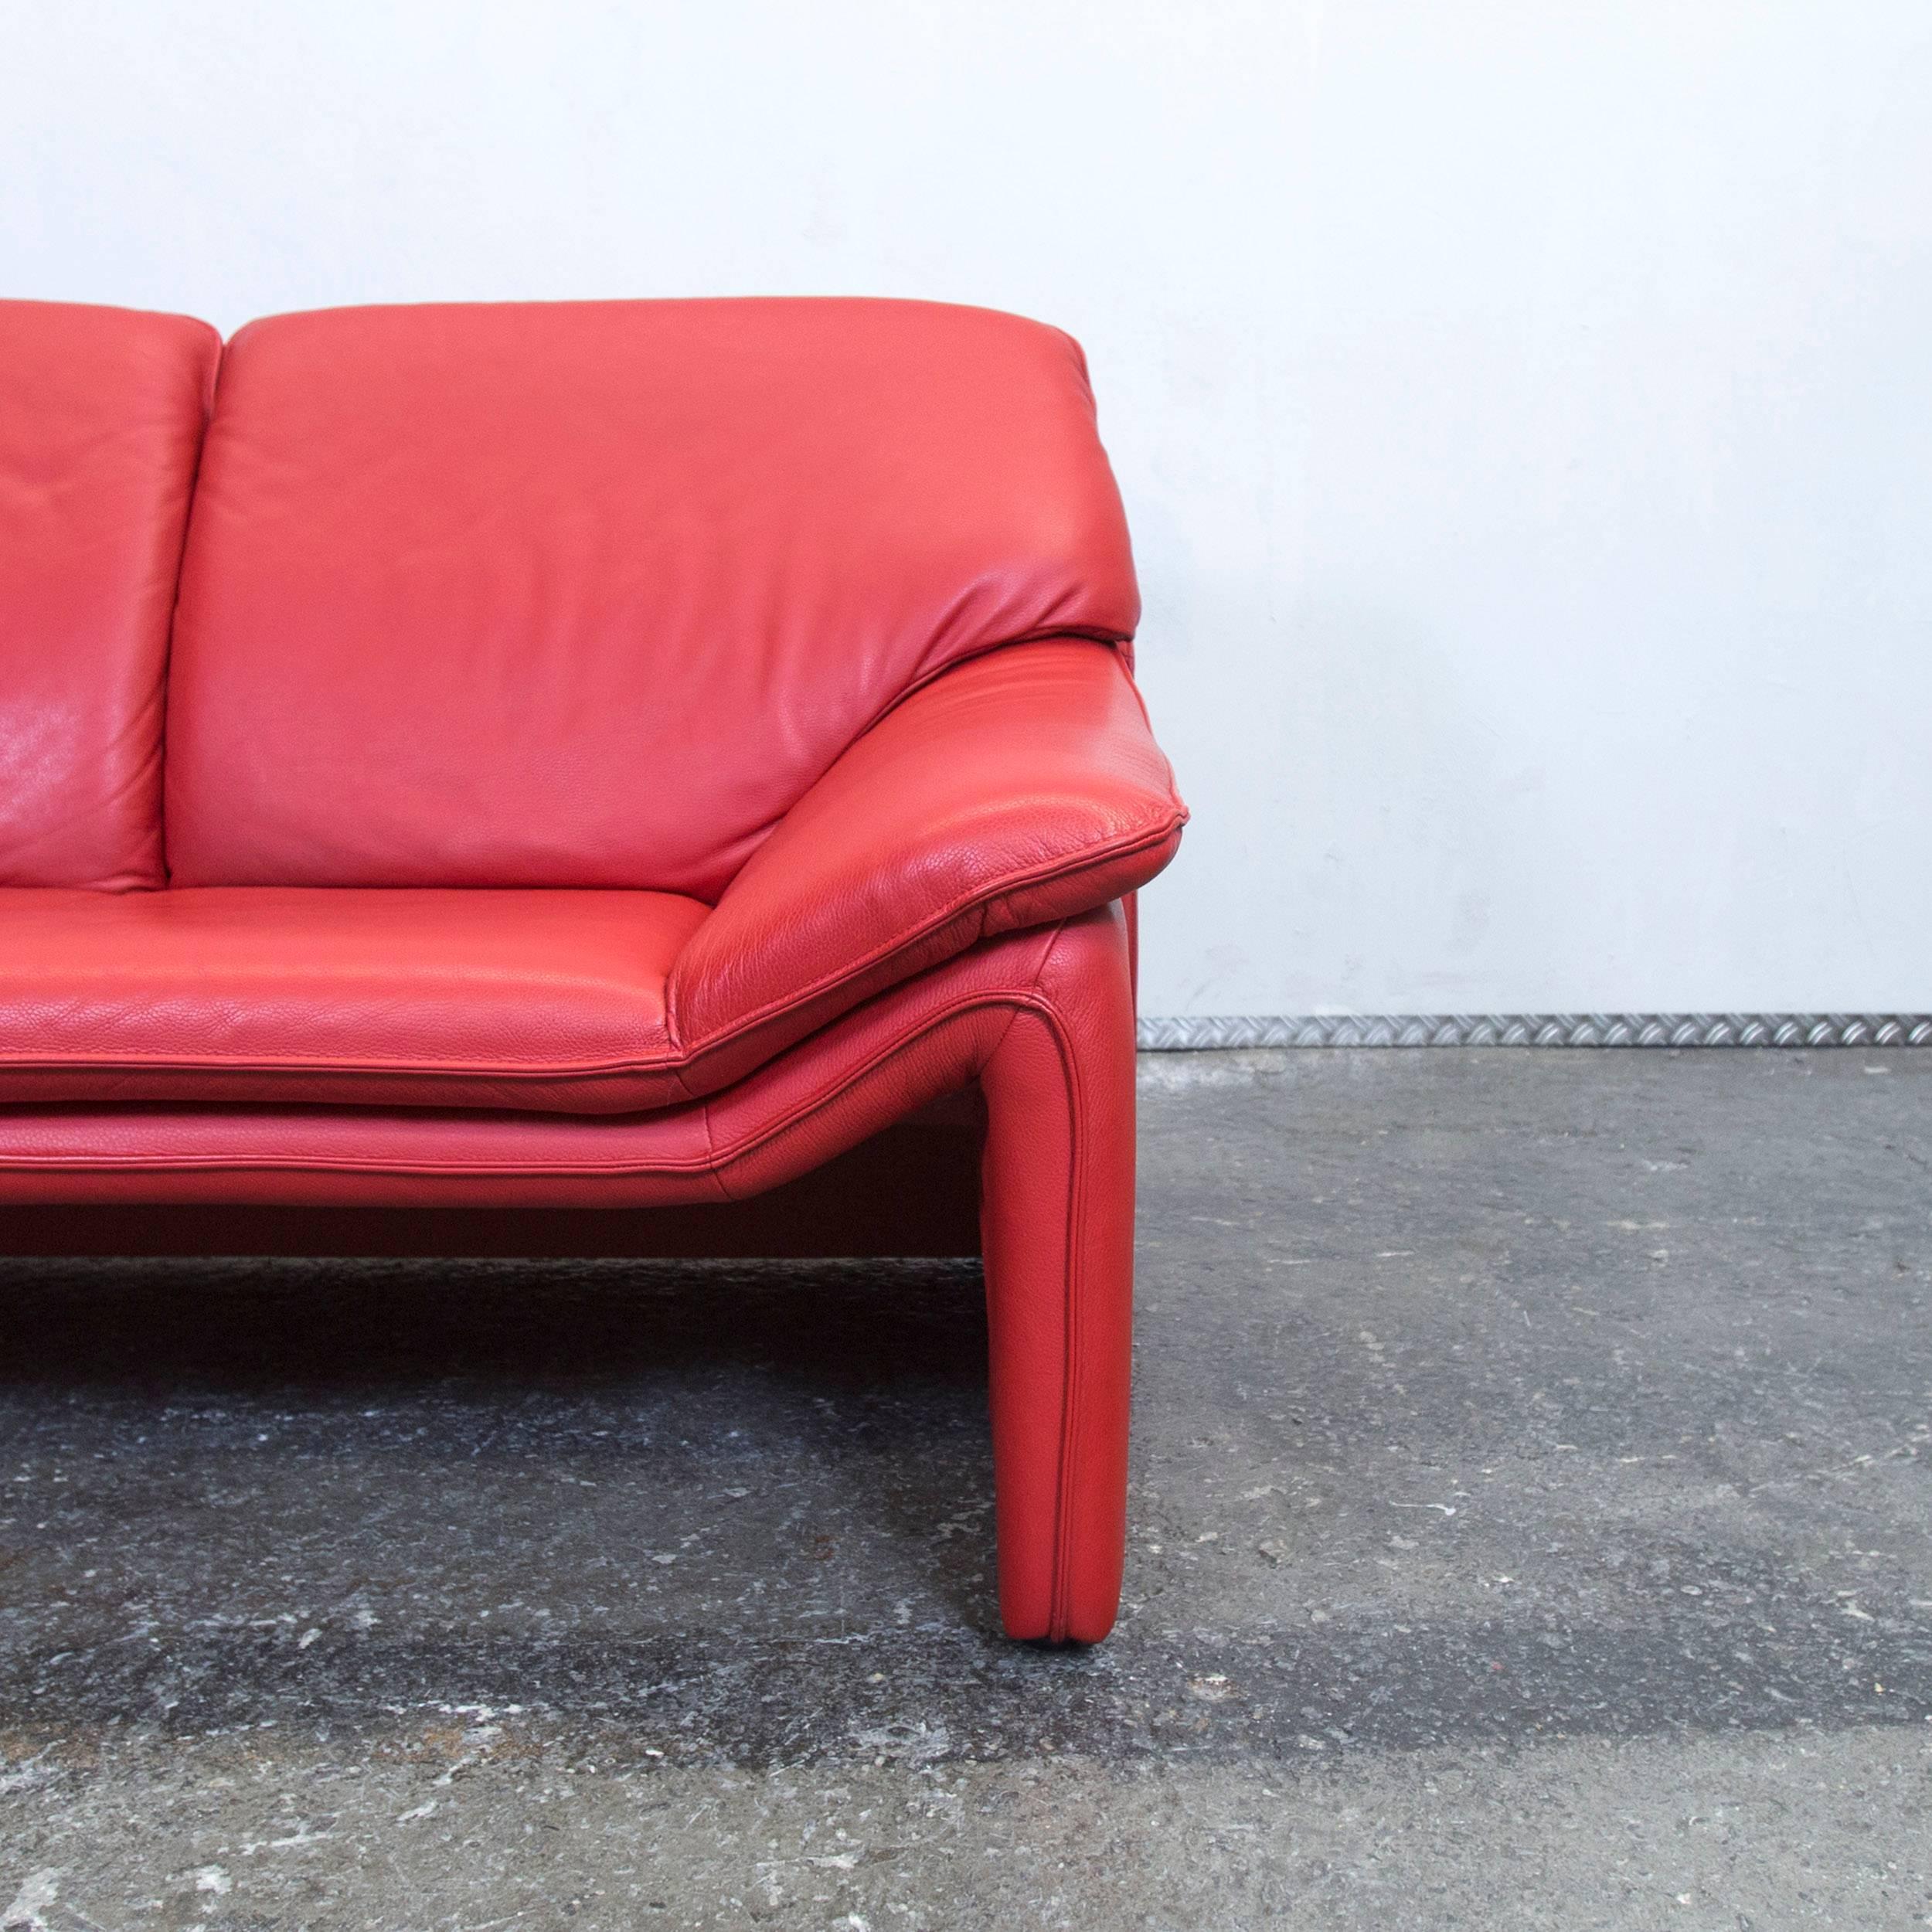 zweisitzer couch zweisitzer couch with zweisitzer couch german laauser atlanta designer sofa. Black Bedroom Furniture Sets. Home Design Ideas